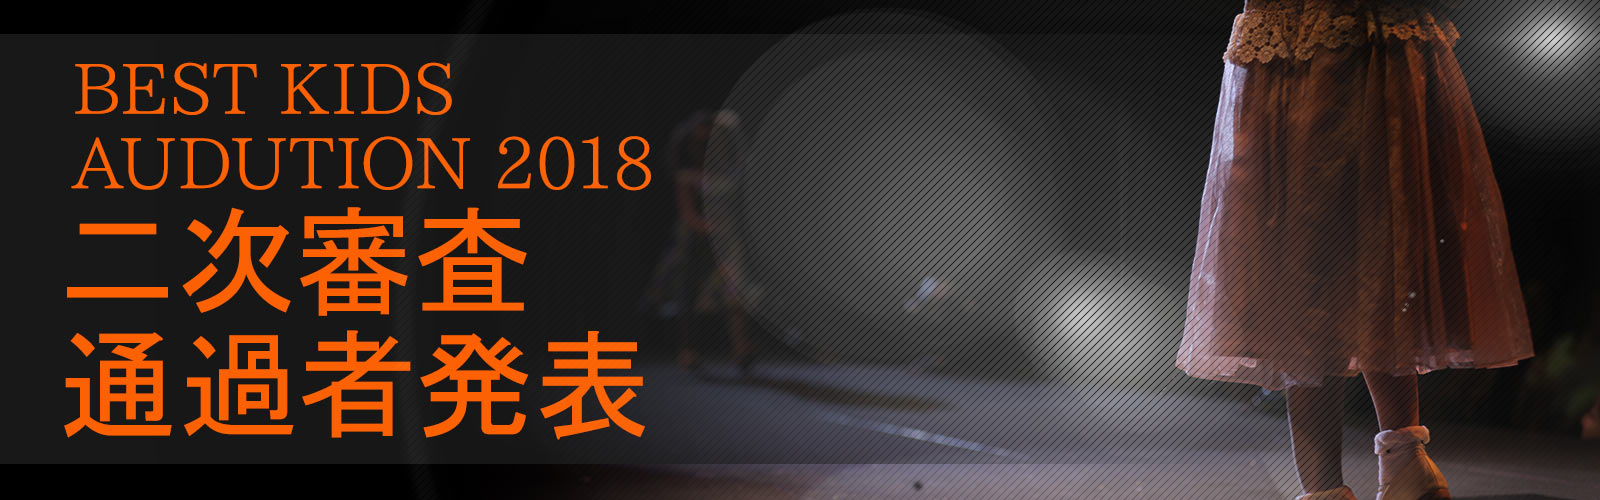 BEST KIDS AUDITION 2018 二次審査通過者発表